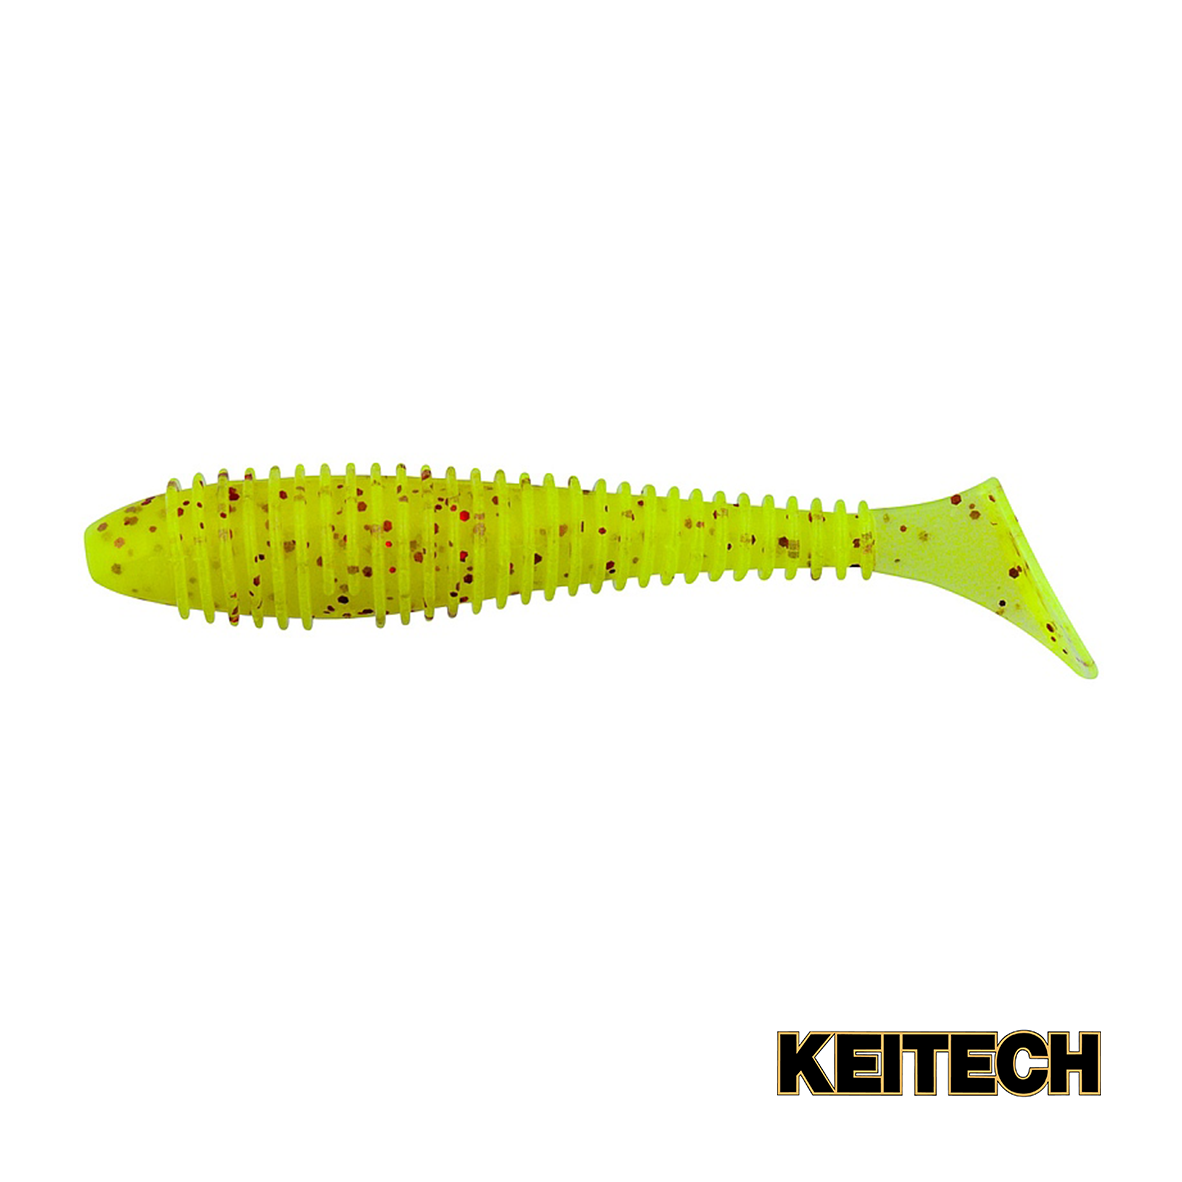 "Силикон Keitech Swing Impact FAT 4.3"" (5 шт/упак) ц:pal#01 chartr"